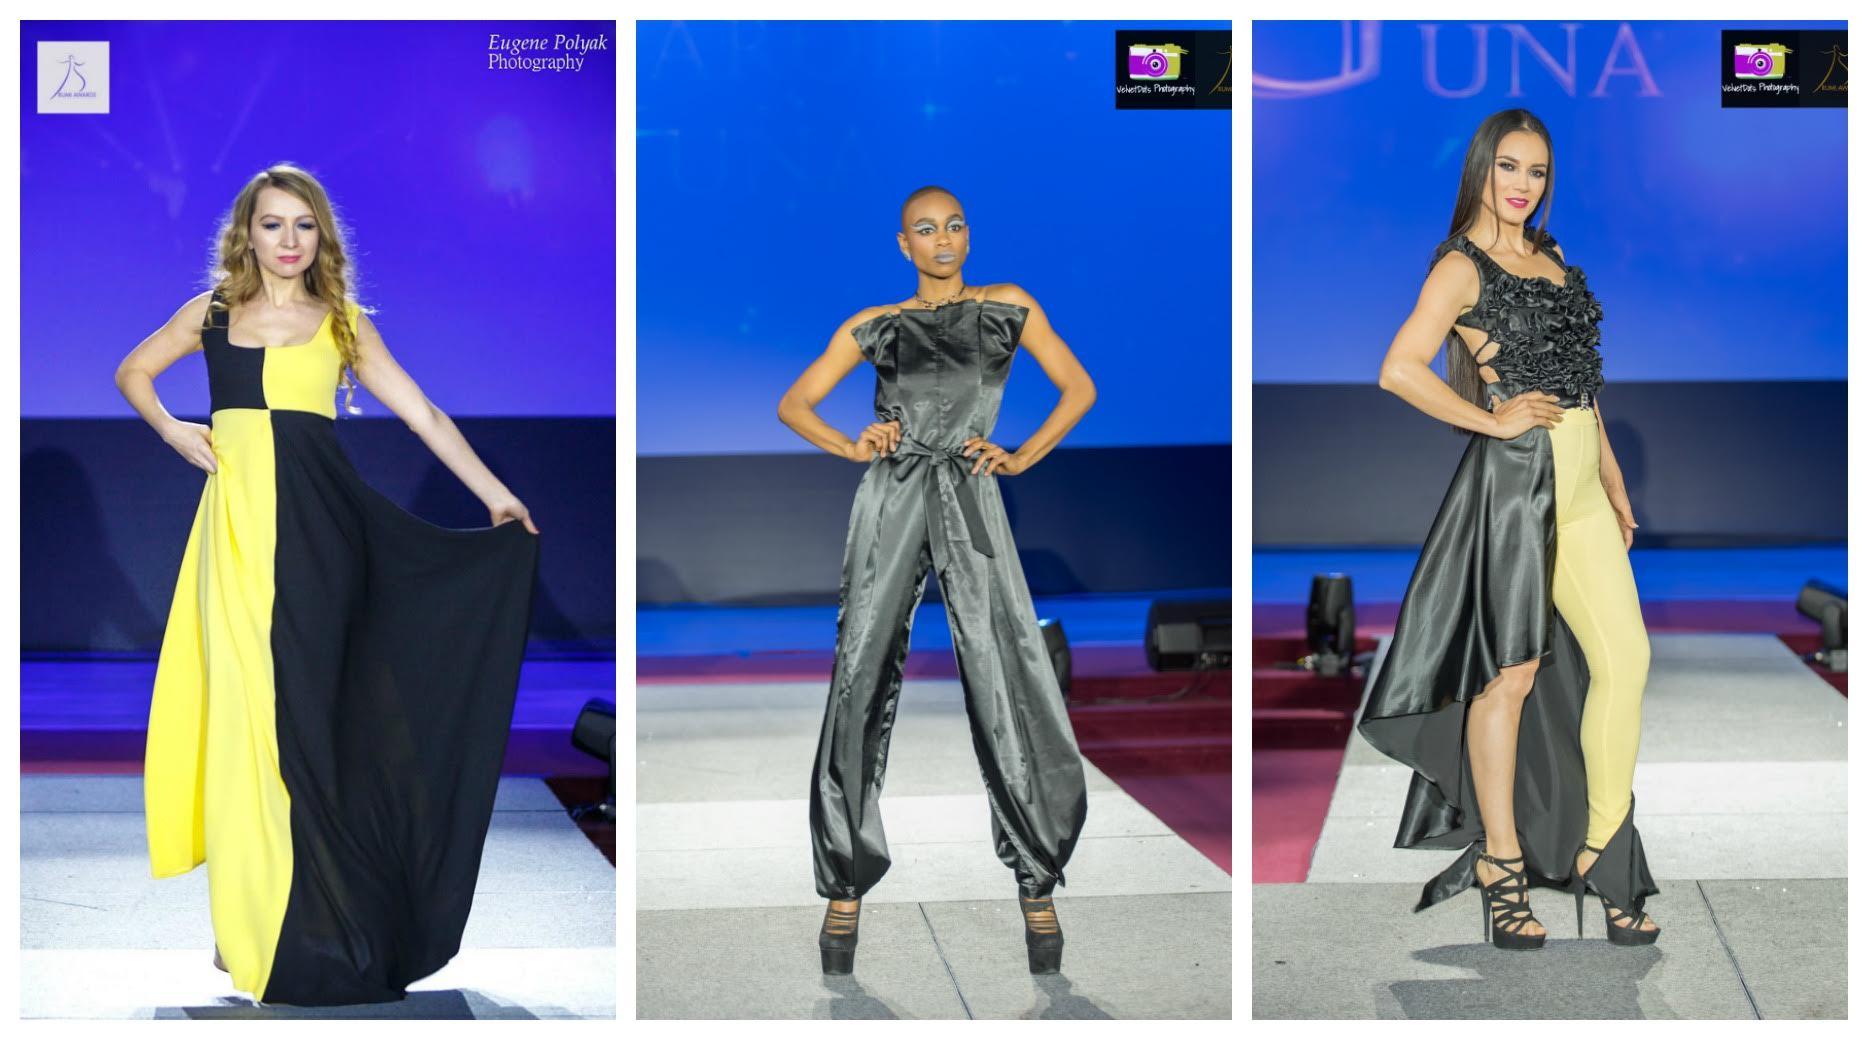 Carolina Guna Triumphs At The Rumi International Fashion Awards!